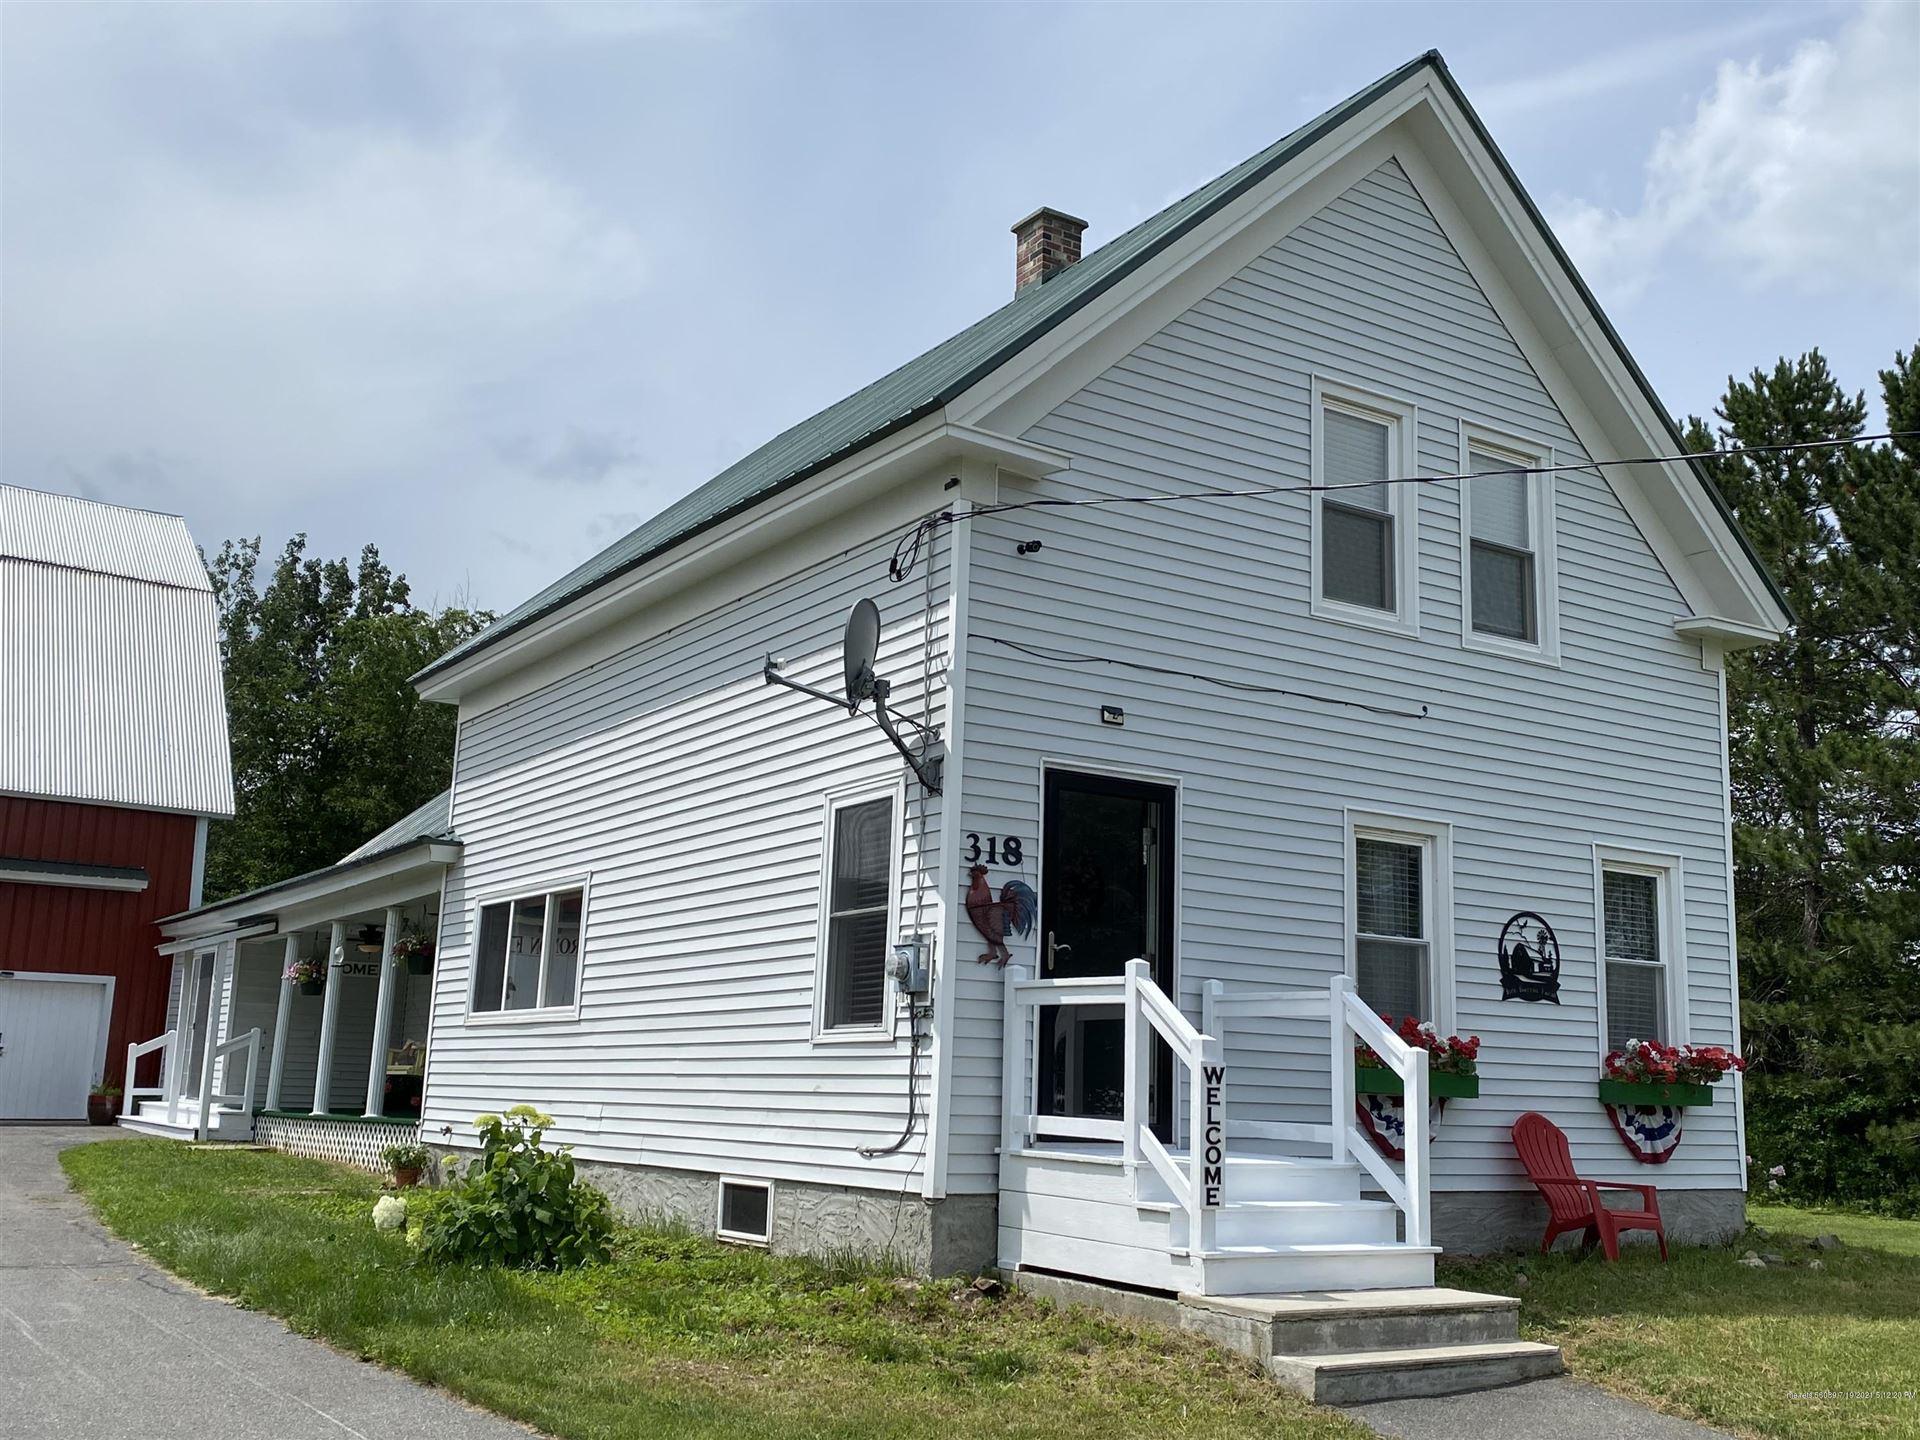 Photo of 318 Turner Road, Castle Hill, ME 04757 (MLS # 1501313)